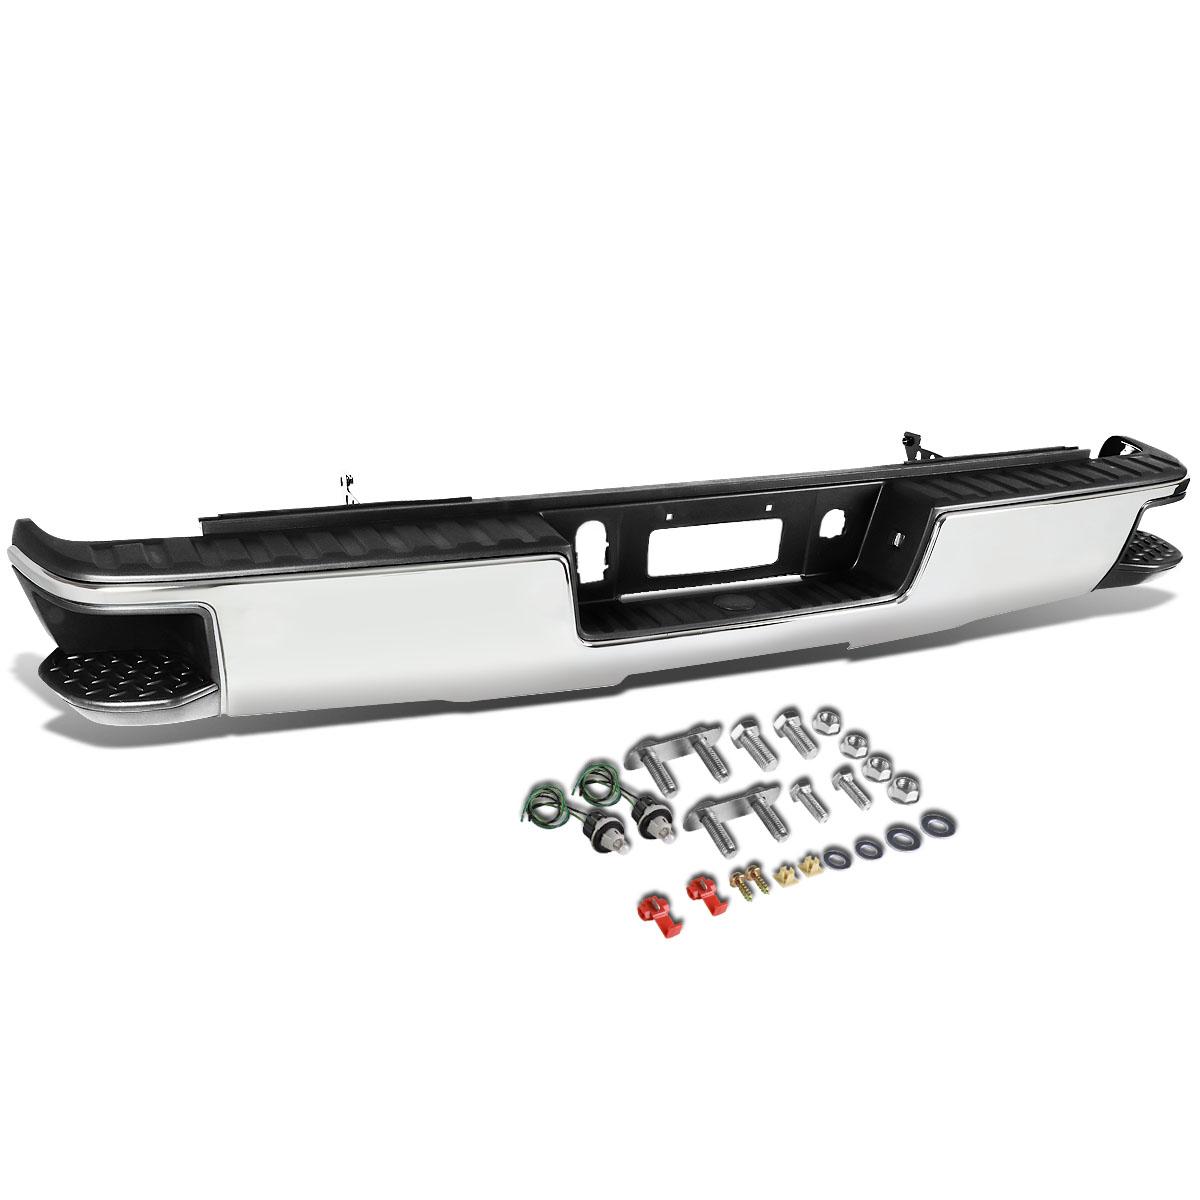 For 14-18 Chevy Silverado / GMC Sierra Chrome Rear Corner Step Bumper (No Park Distance Sensor Hole) 15 16 17